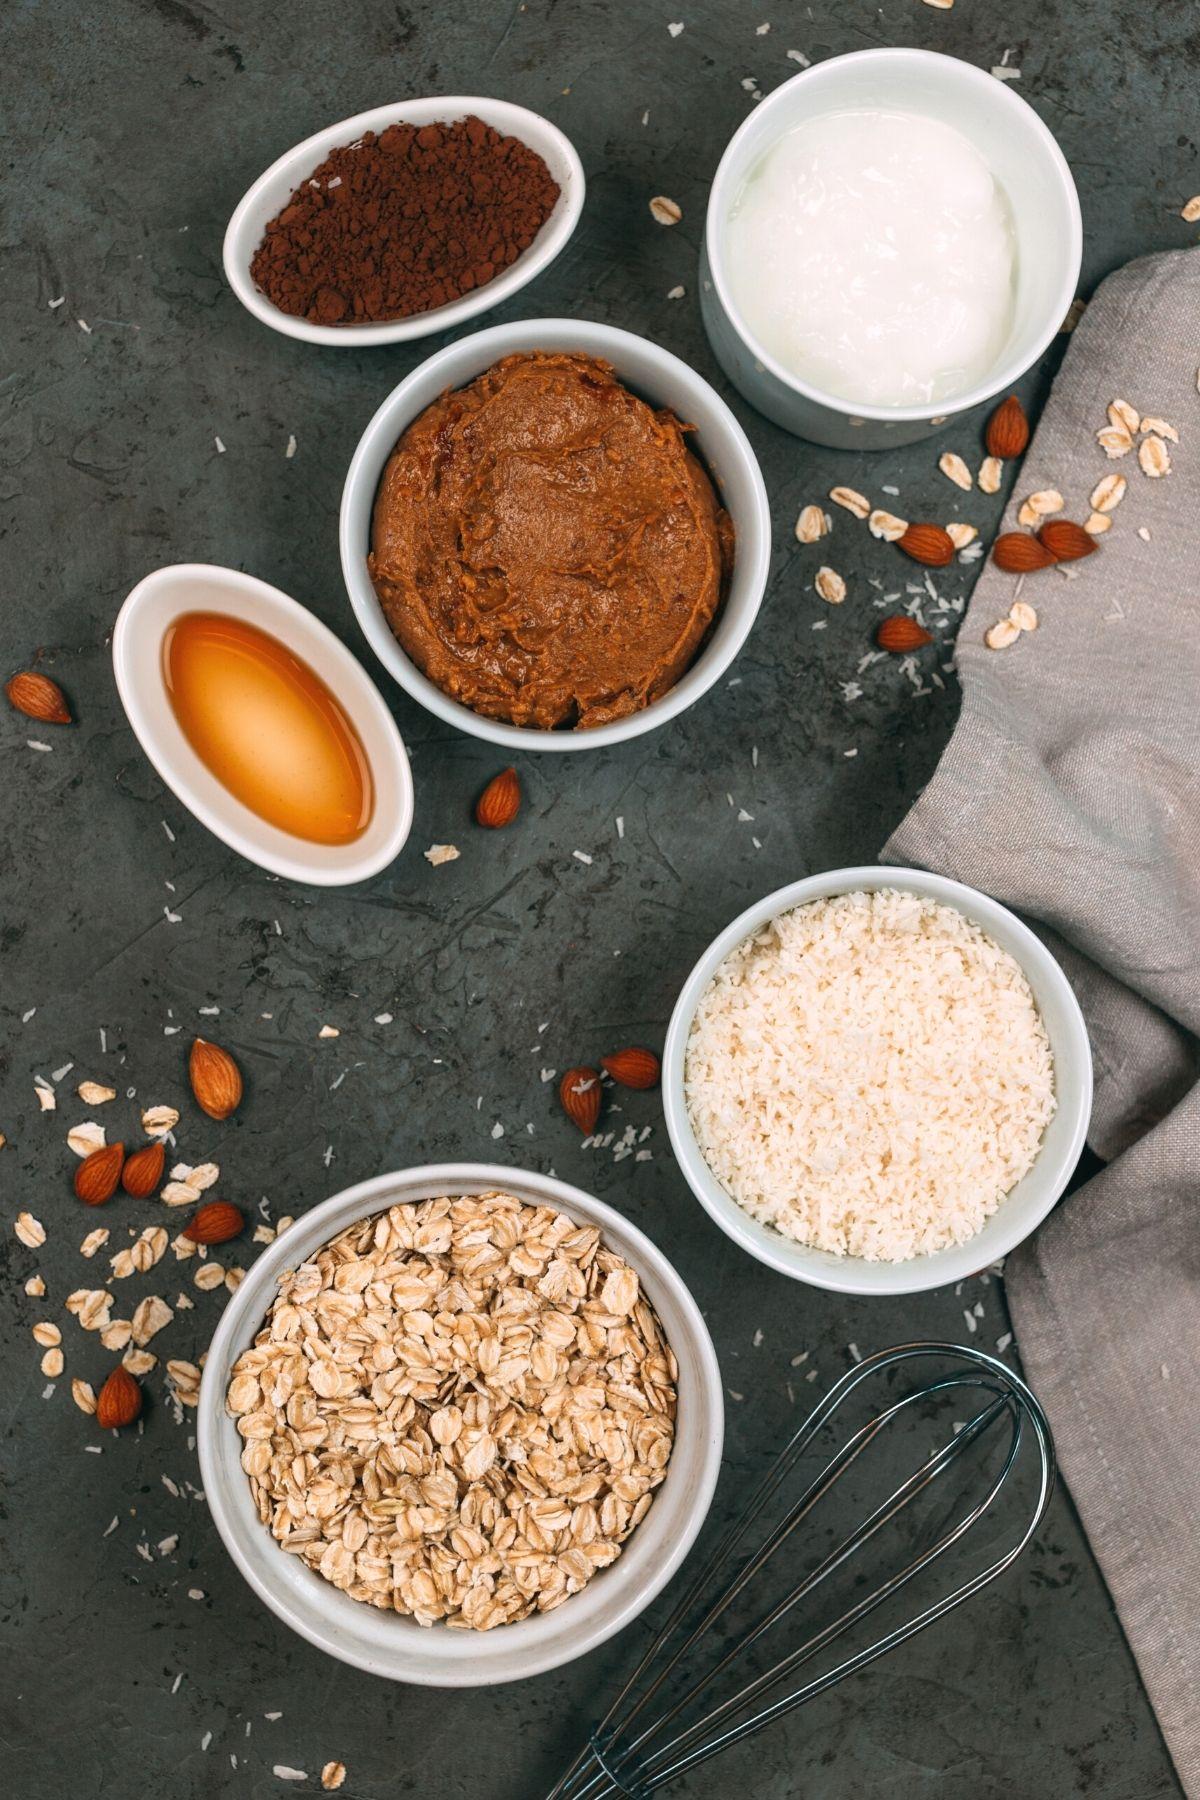 Oatmeal bars ingredients